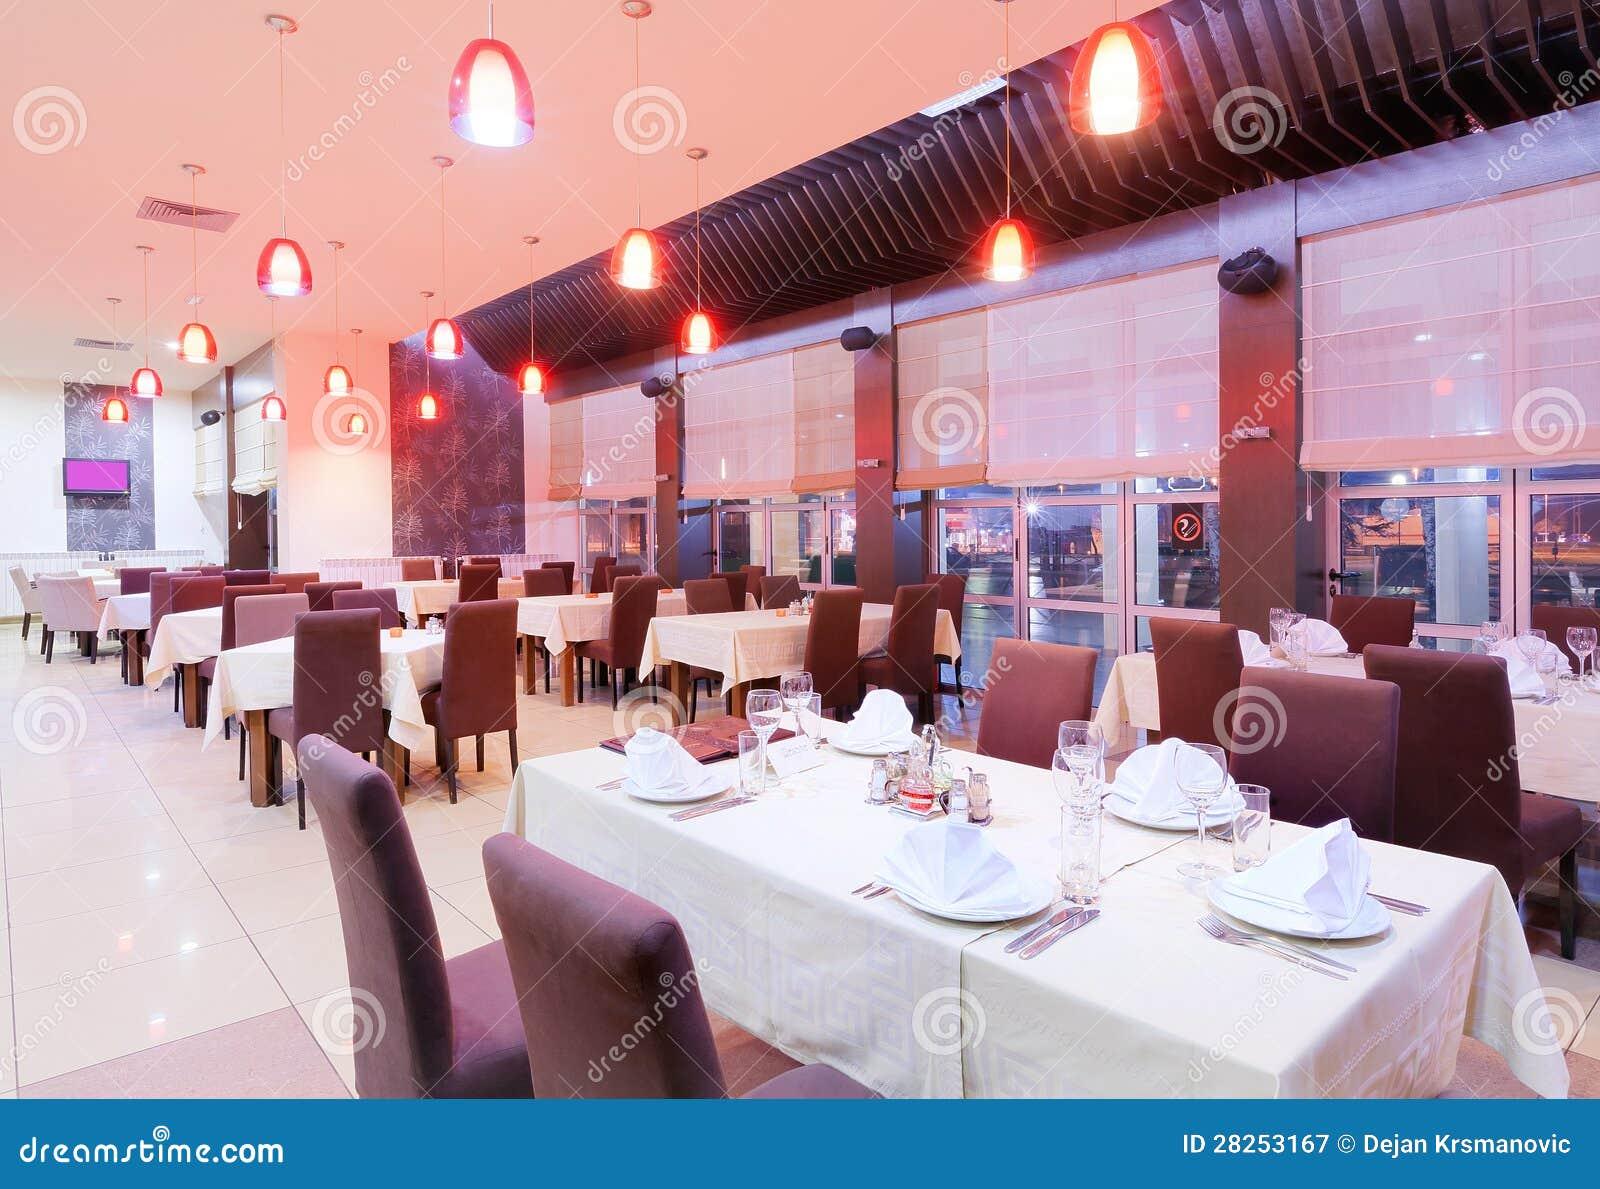 Restaurant interior royalty free stock photography image